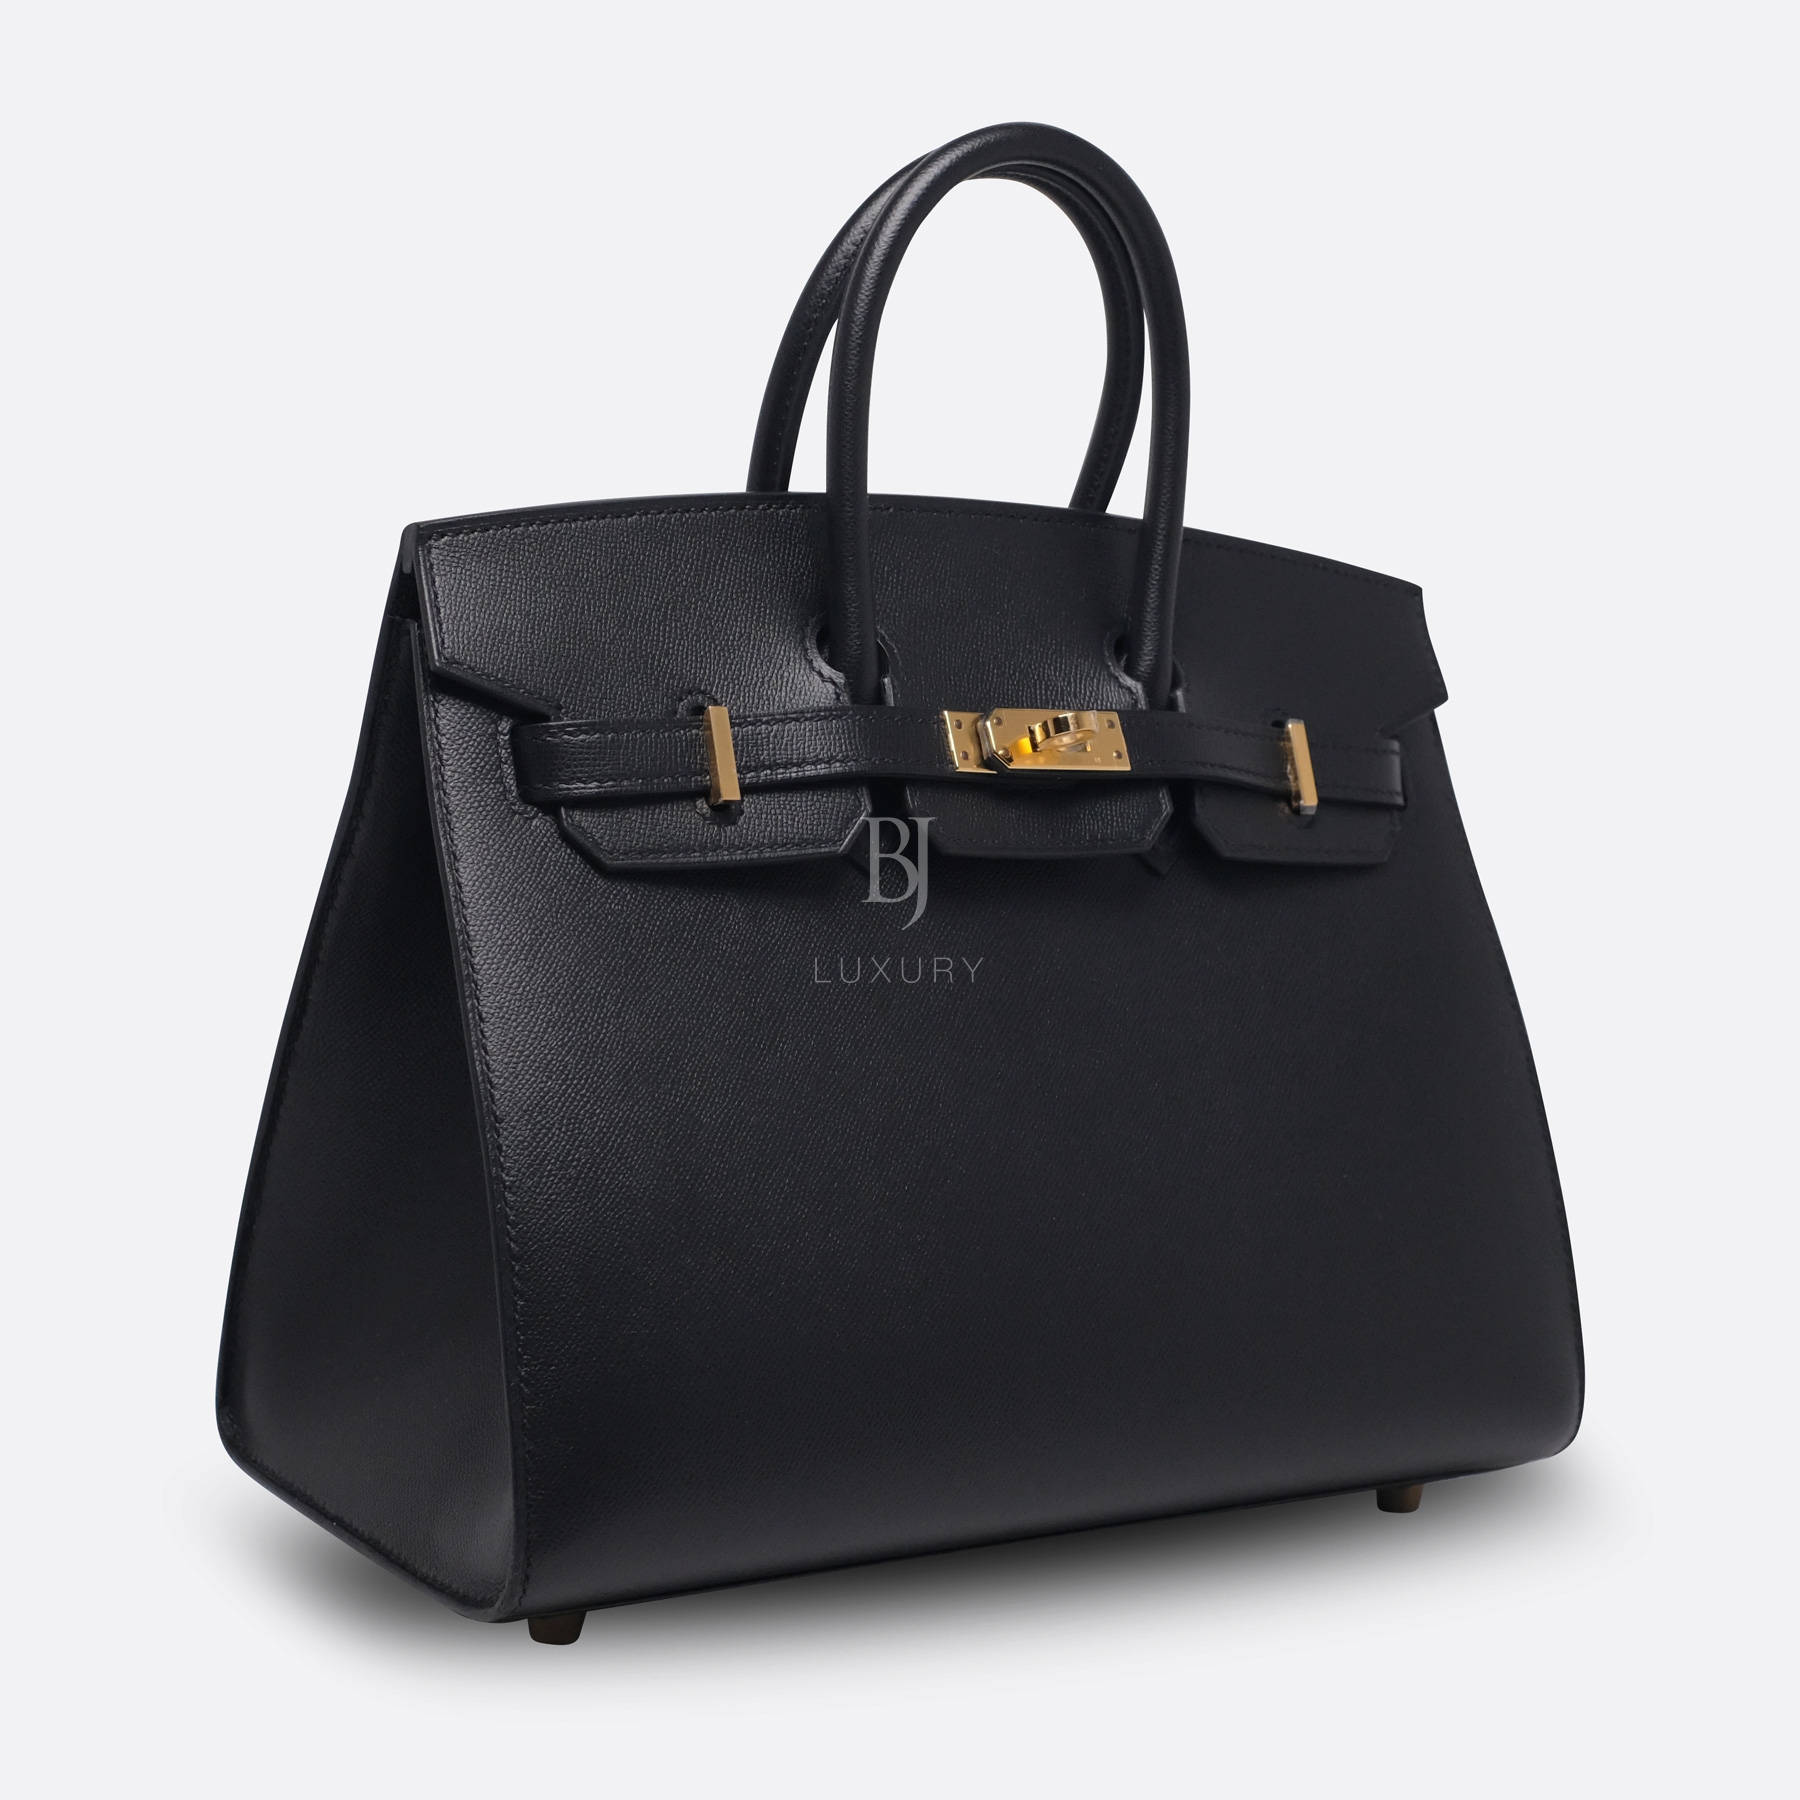 Birkin Sellier 25 Black Veau Madame Gold BJ Luxury 10.jpg